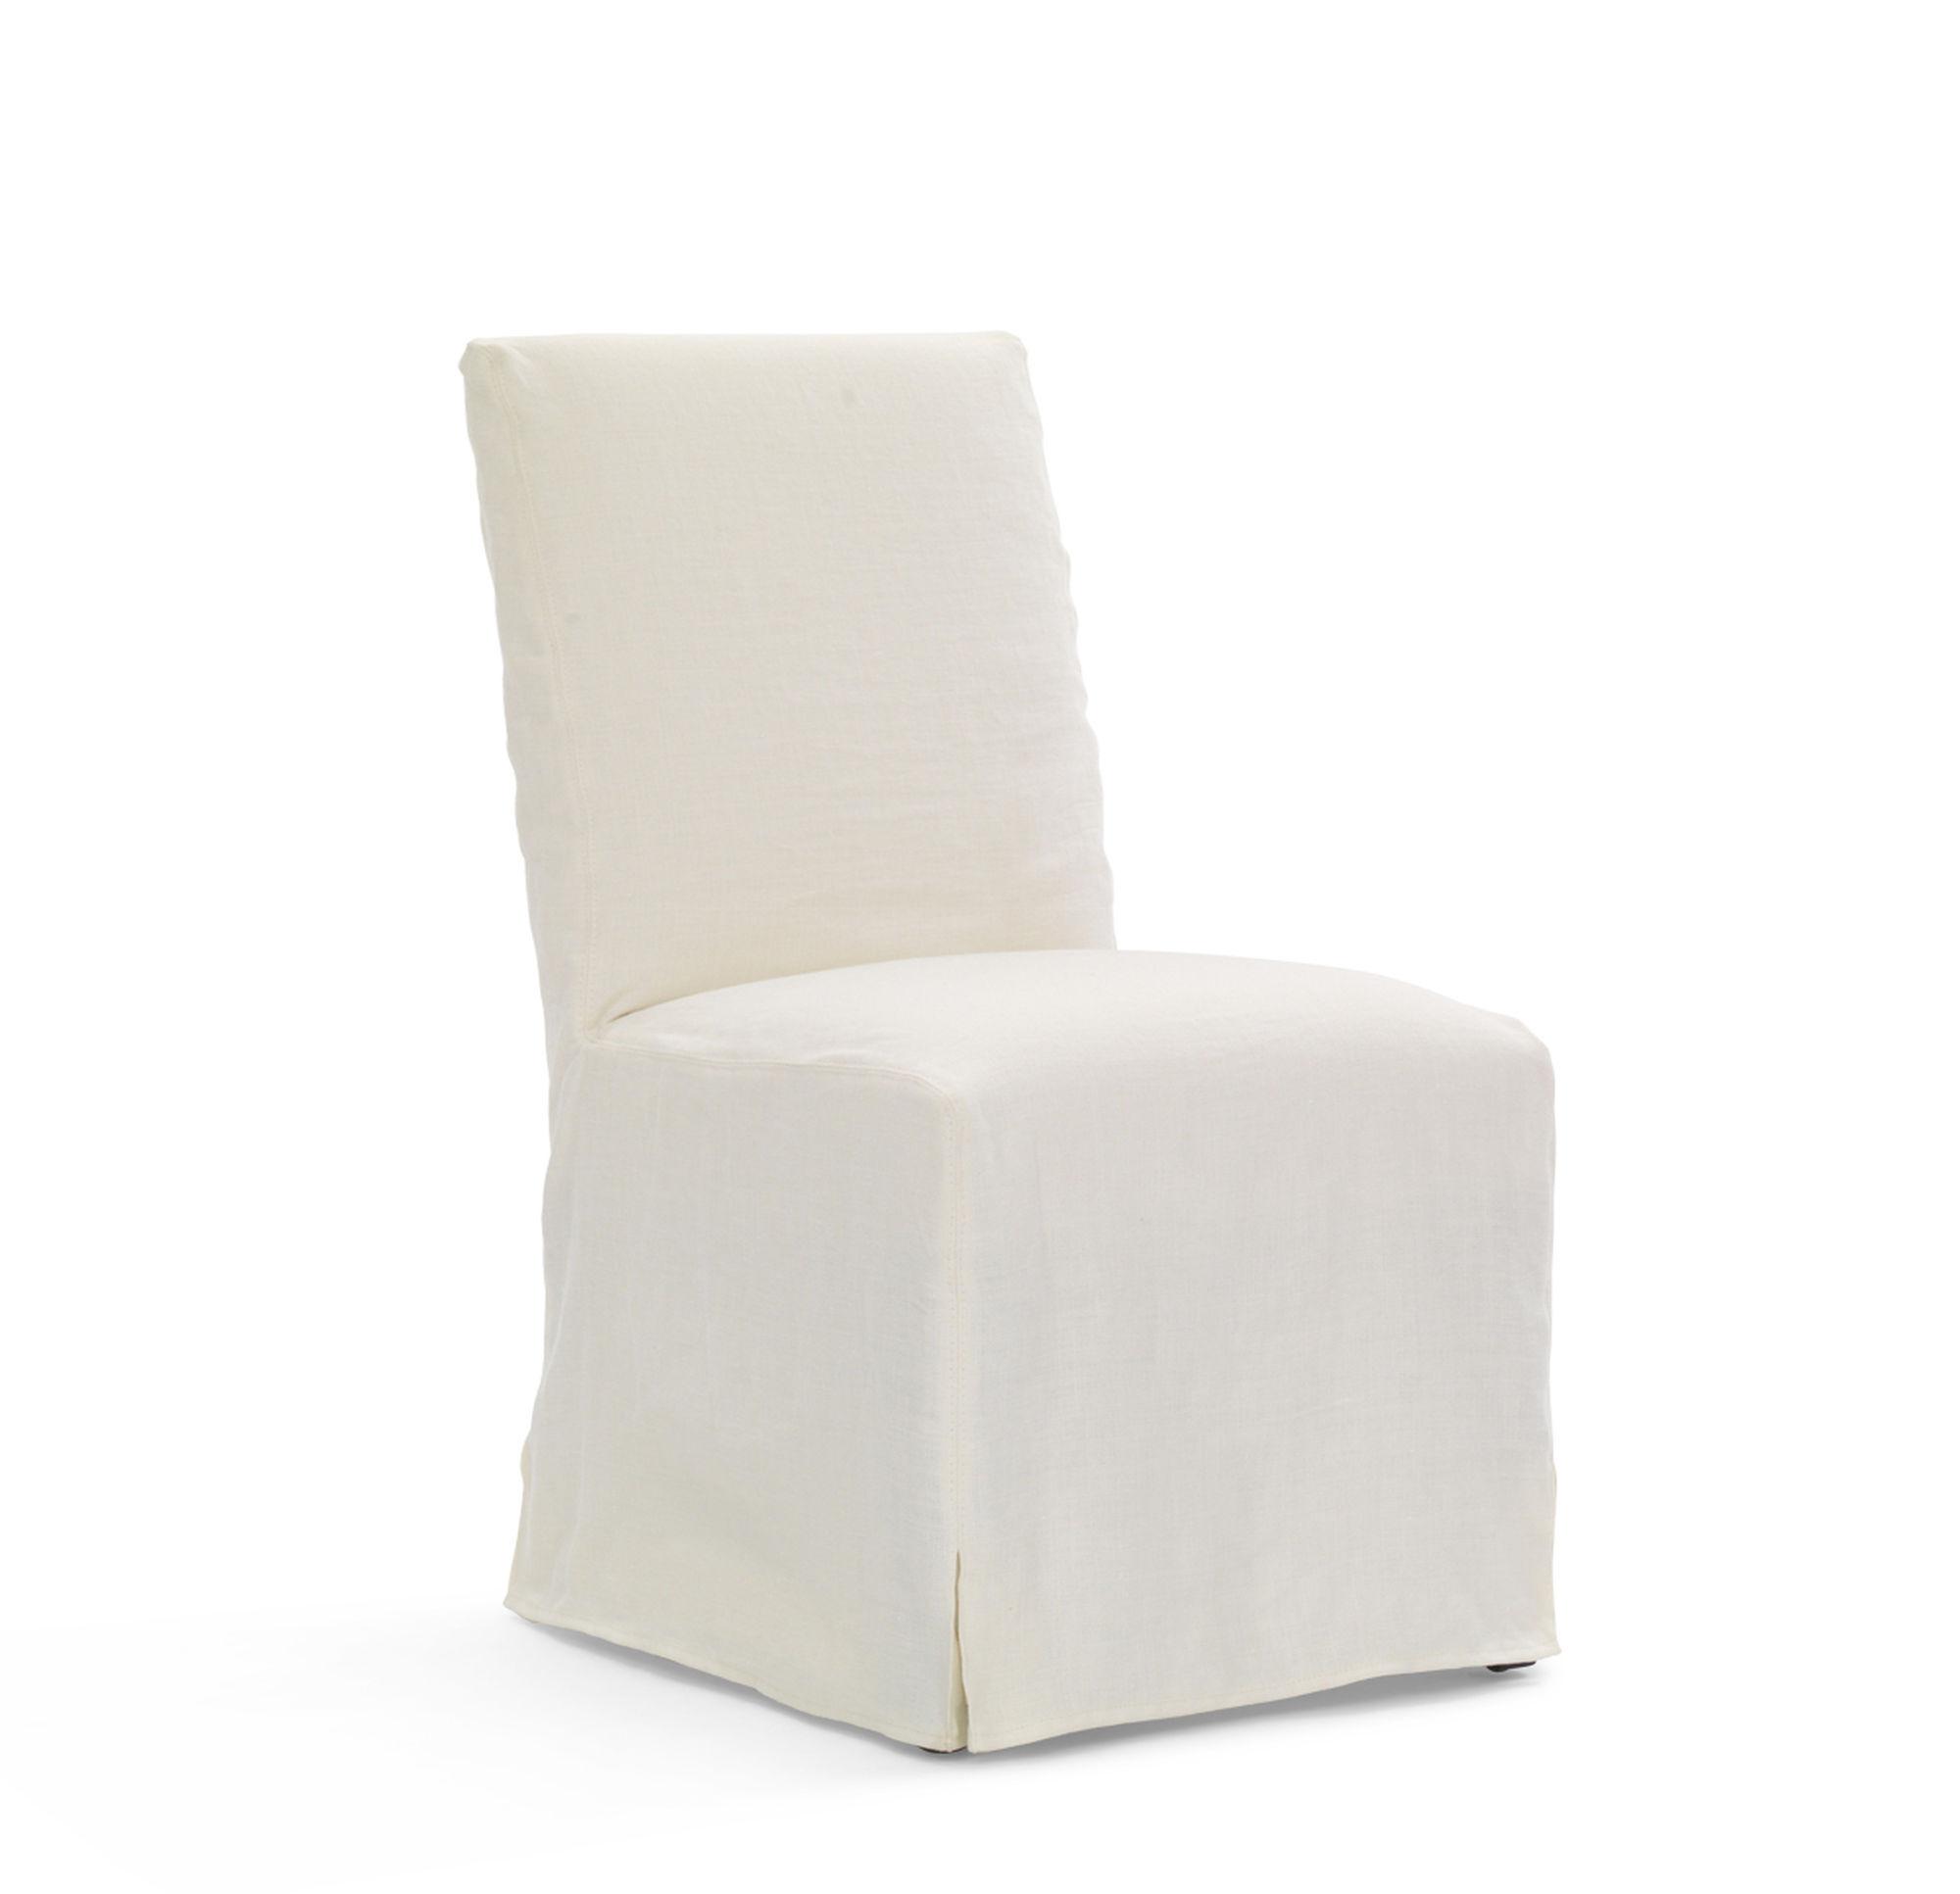 Swanky Julia 1699 124 Sc 104052 Hero A Chair Slipcovers Round Back Chair Slipcovers Set 4 houzz-02 Dining Chair Slipcovers